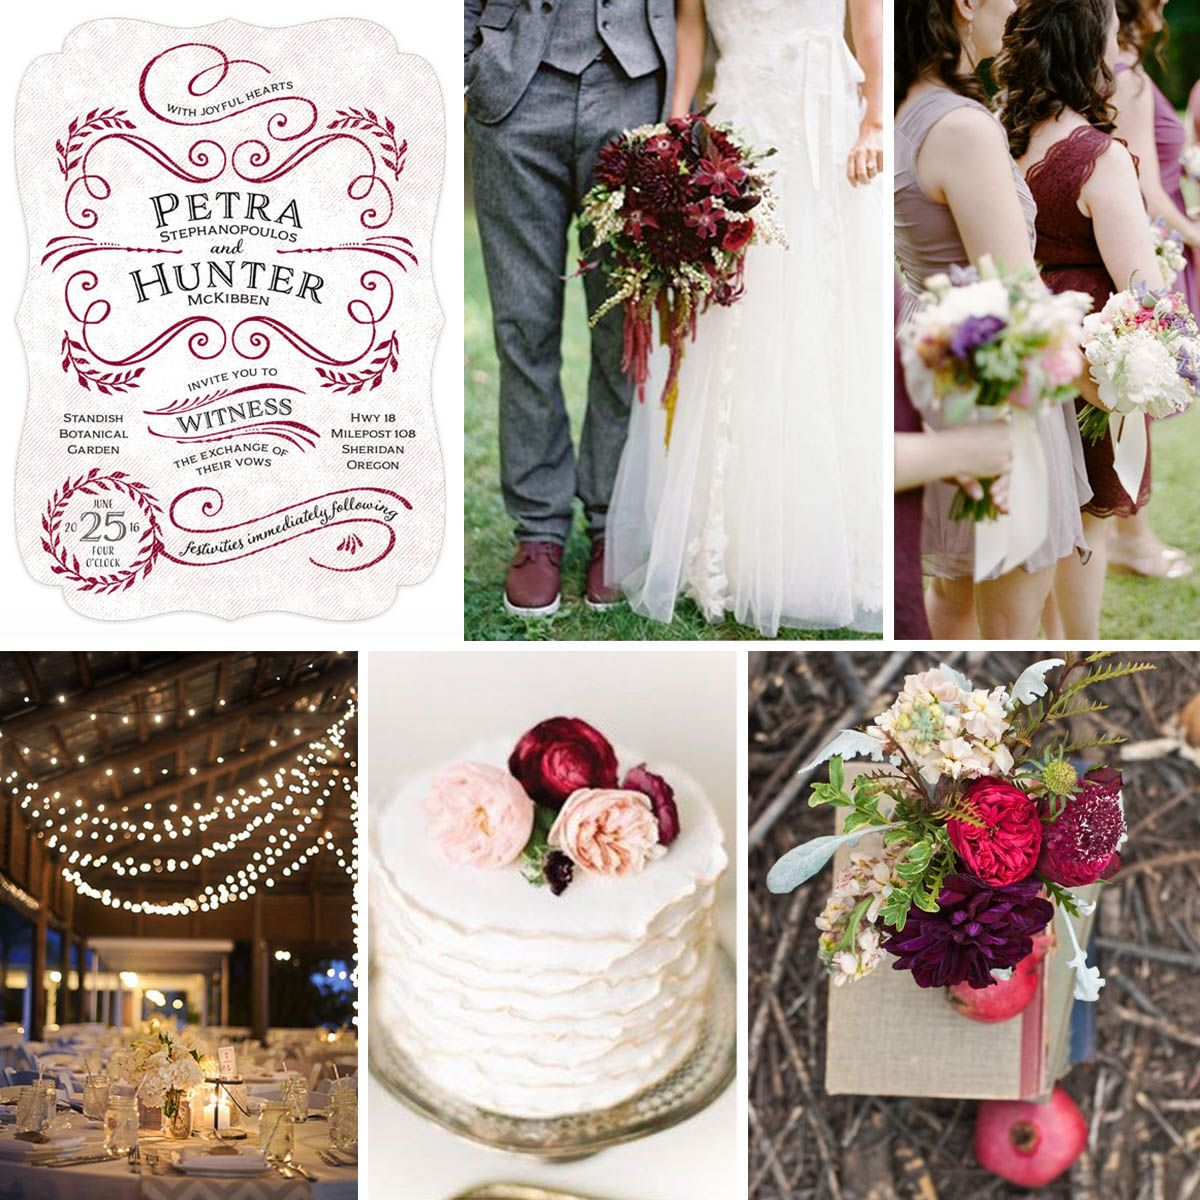 "#Fall #Wedding Inspiration featuring ""Joy of Scroll"" wedding invitations in deep red."